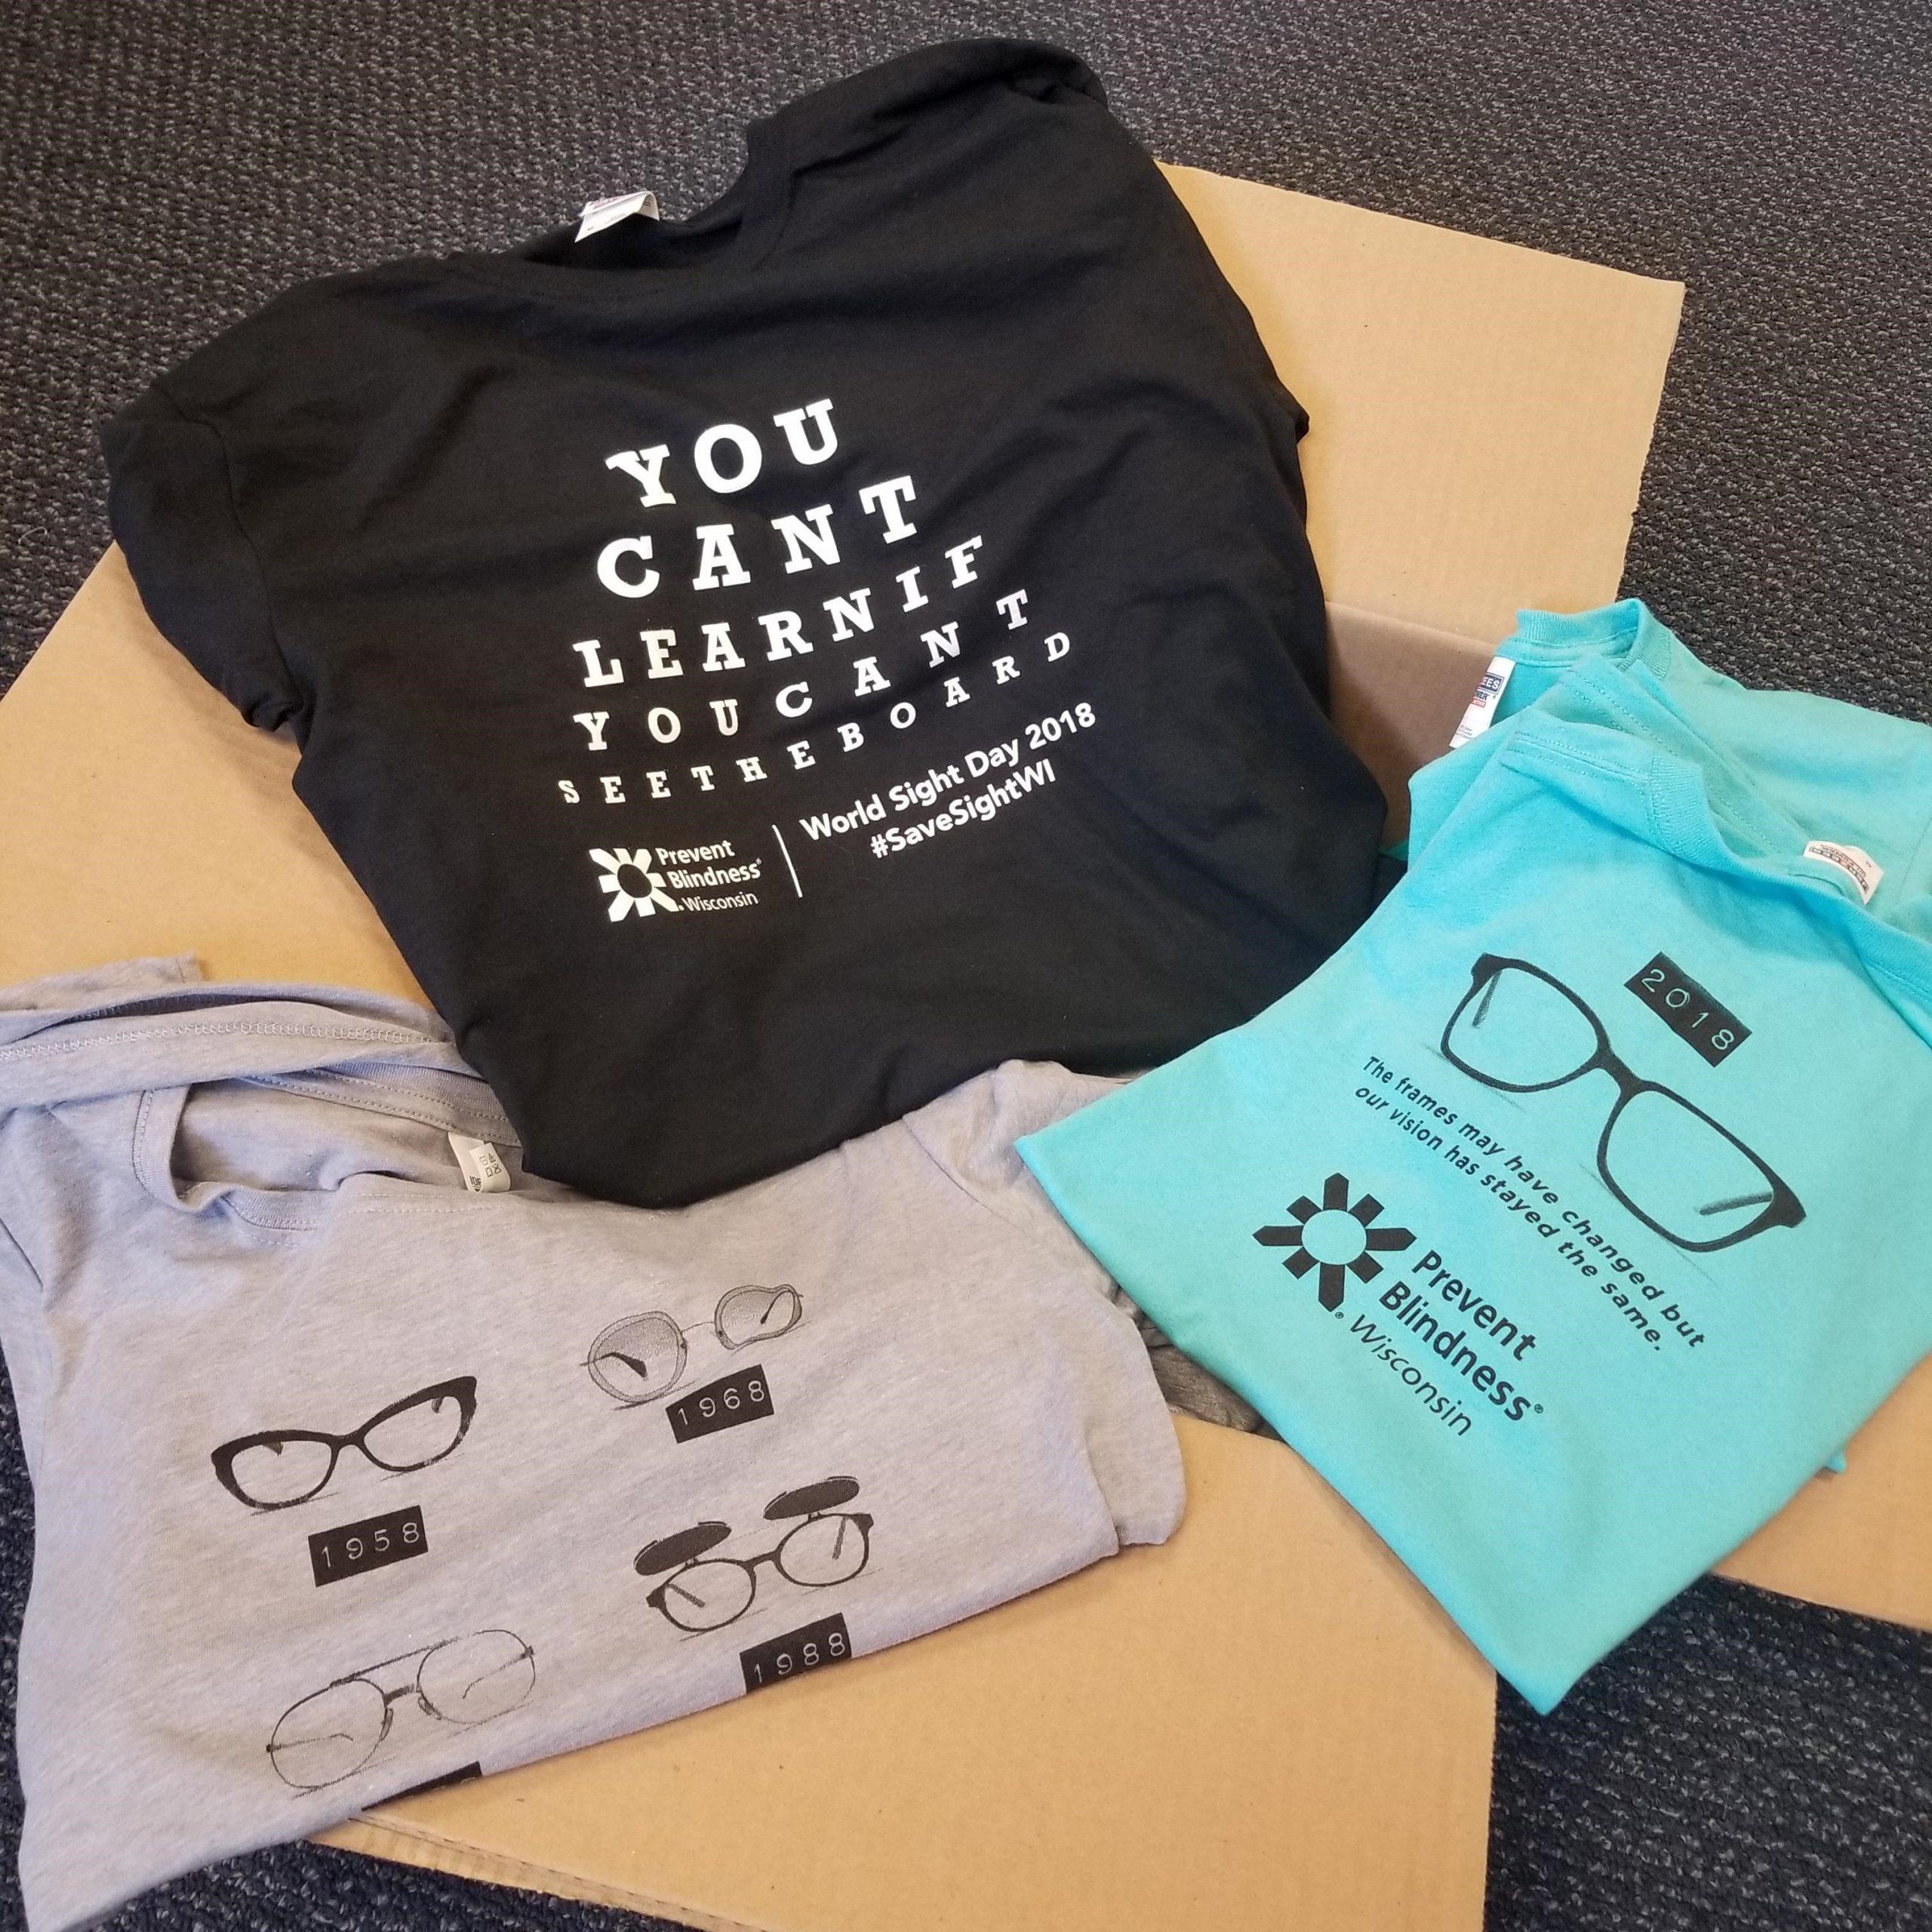 T-shirt order